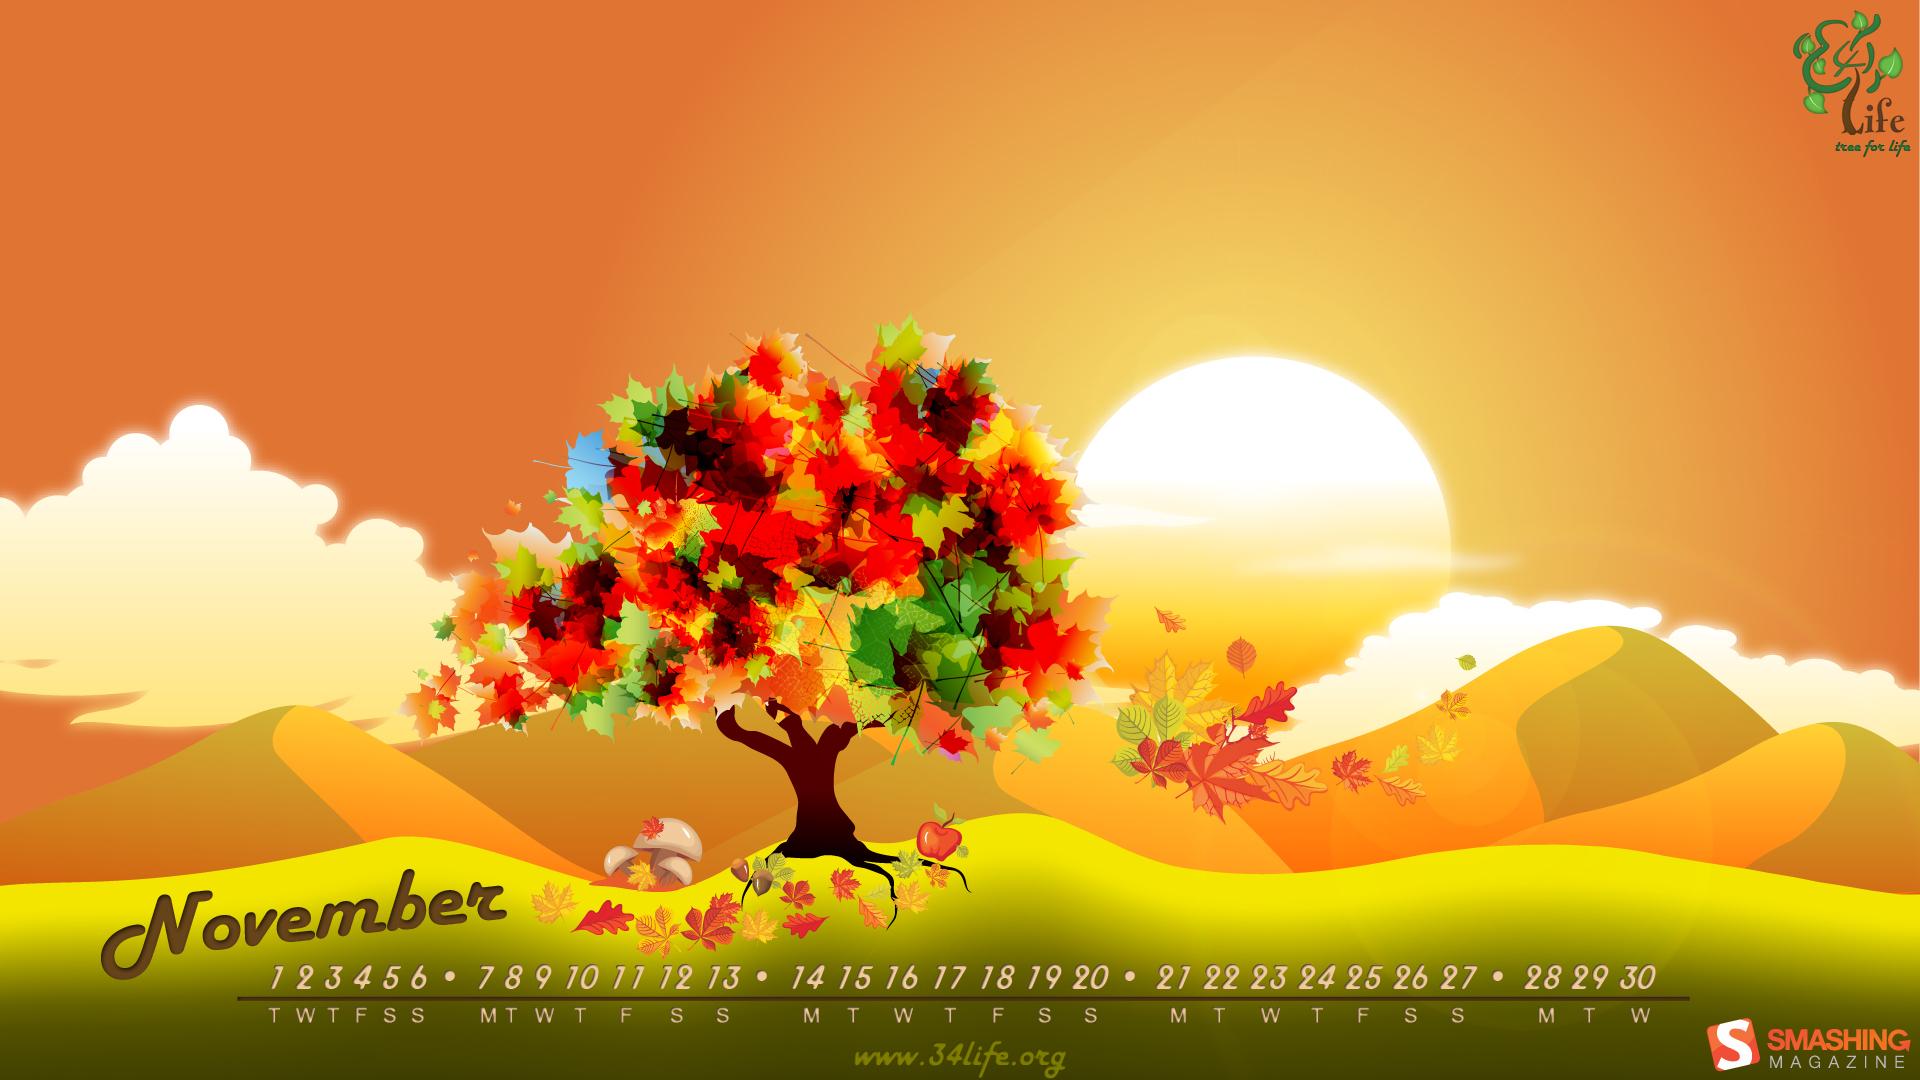 November Wallpaper Desktop HD Background